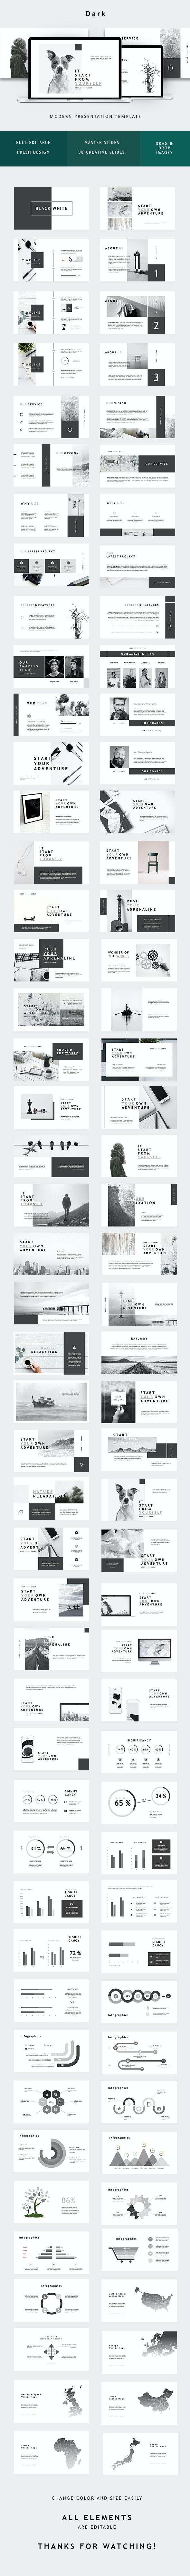 Minimal Creative Powerpoint - PowerPoint Templates Presentation Templates